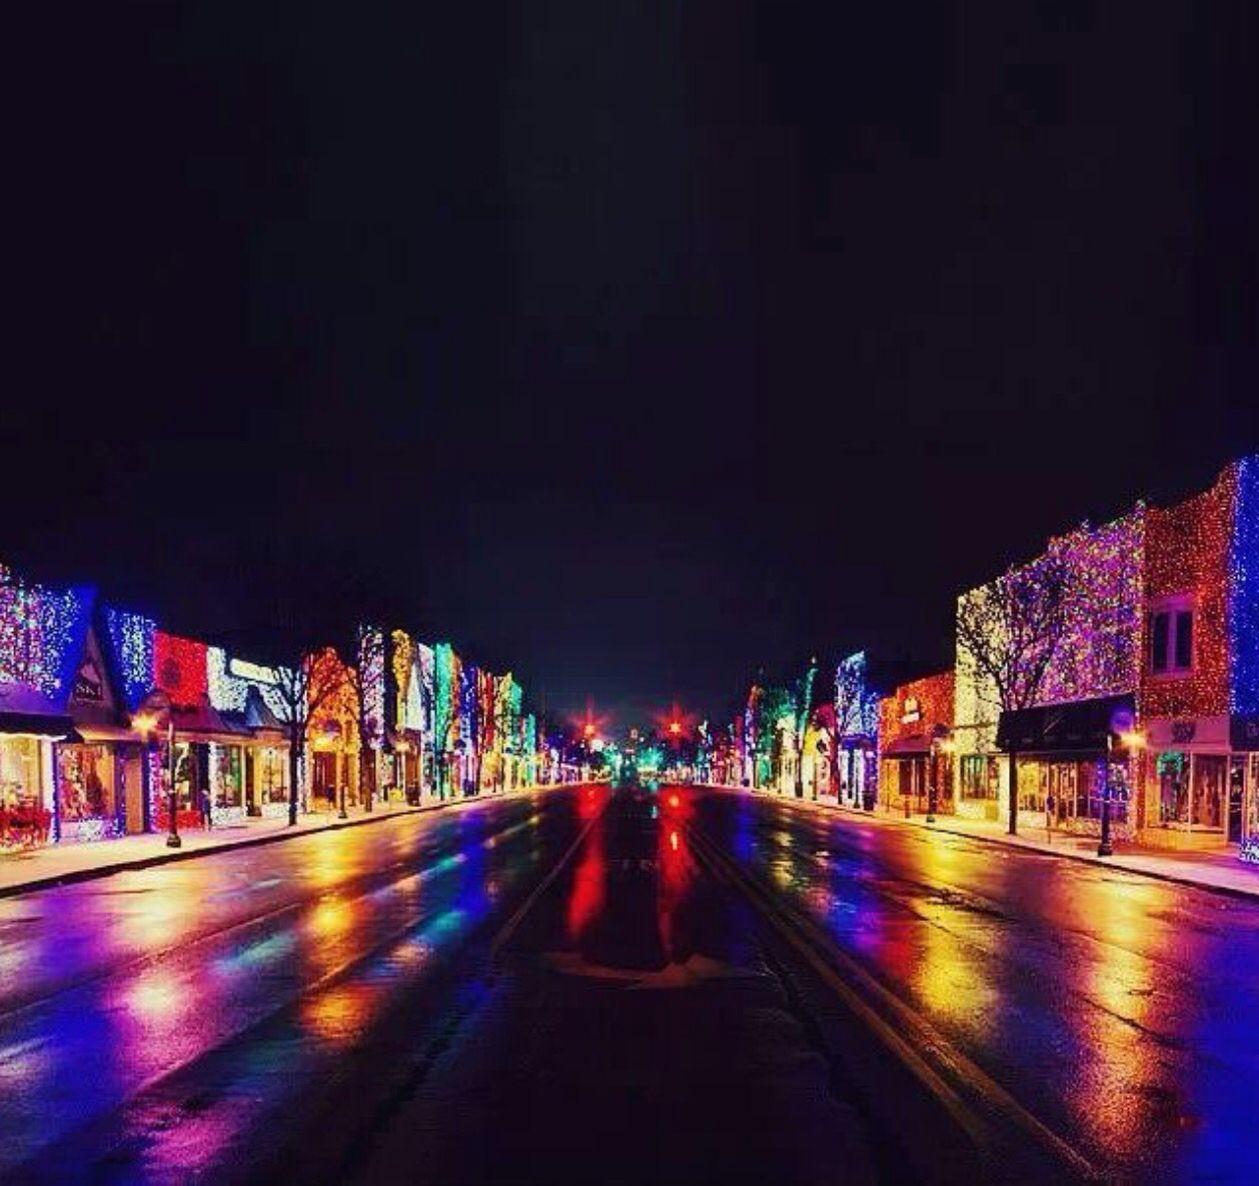 Main Street Rochester, MI Big Bright Light Show And Kris Kringle Market